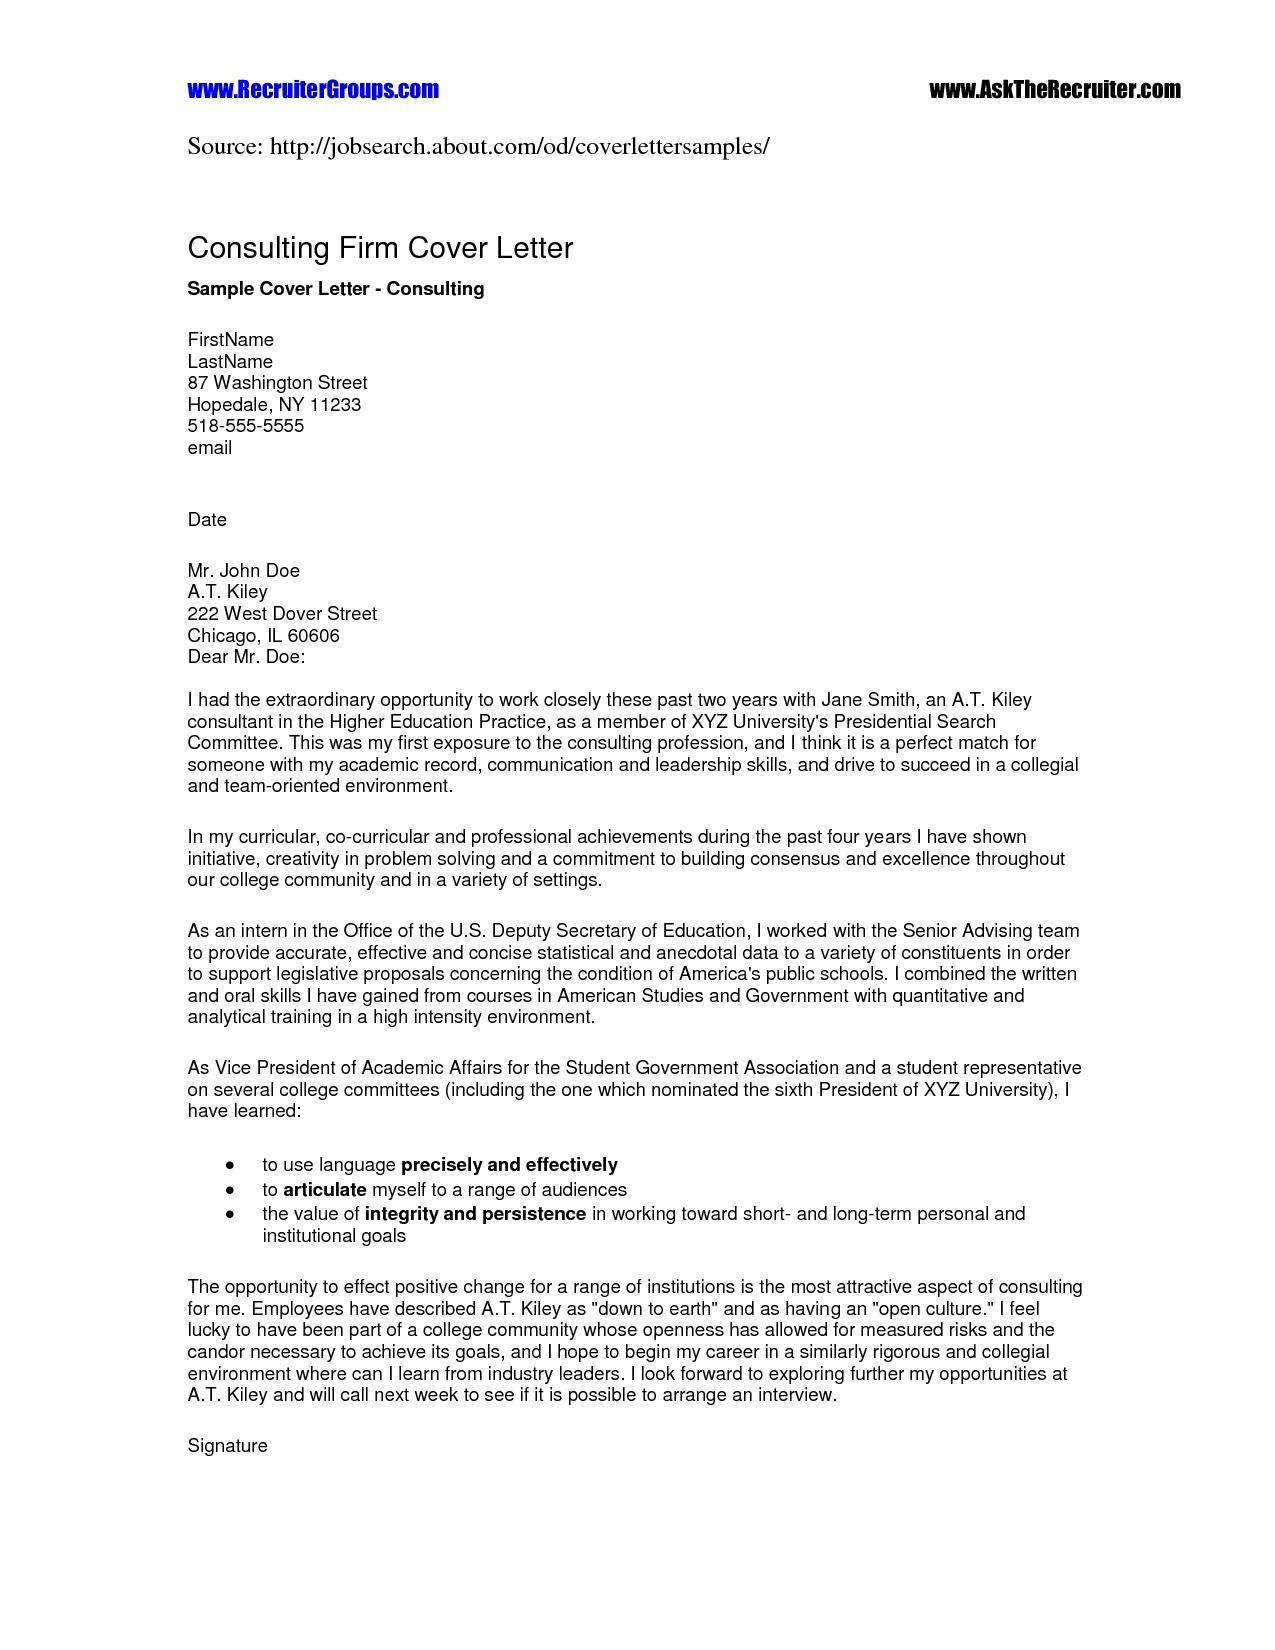 Residency Recommendation Letter Template - Template for Re Mendation Letter Free Creative Re Mendation Letter